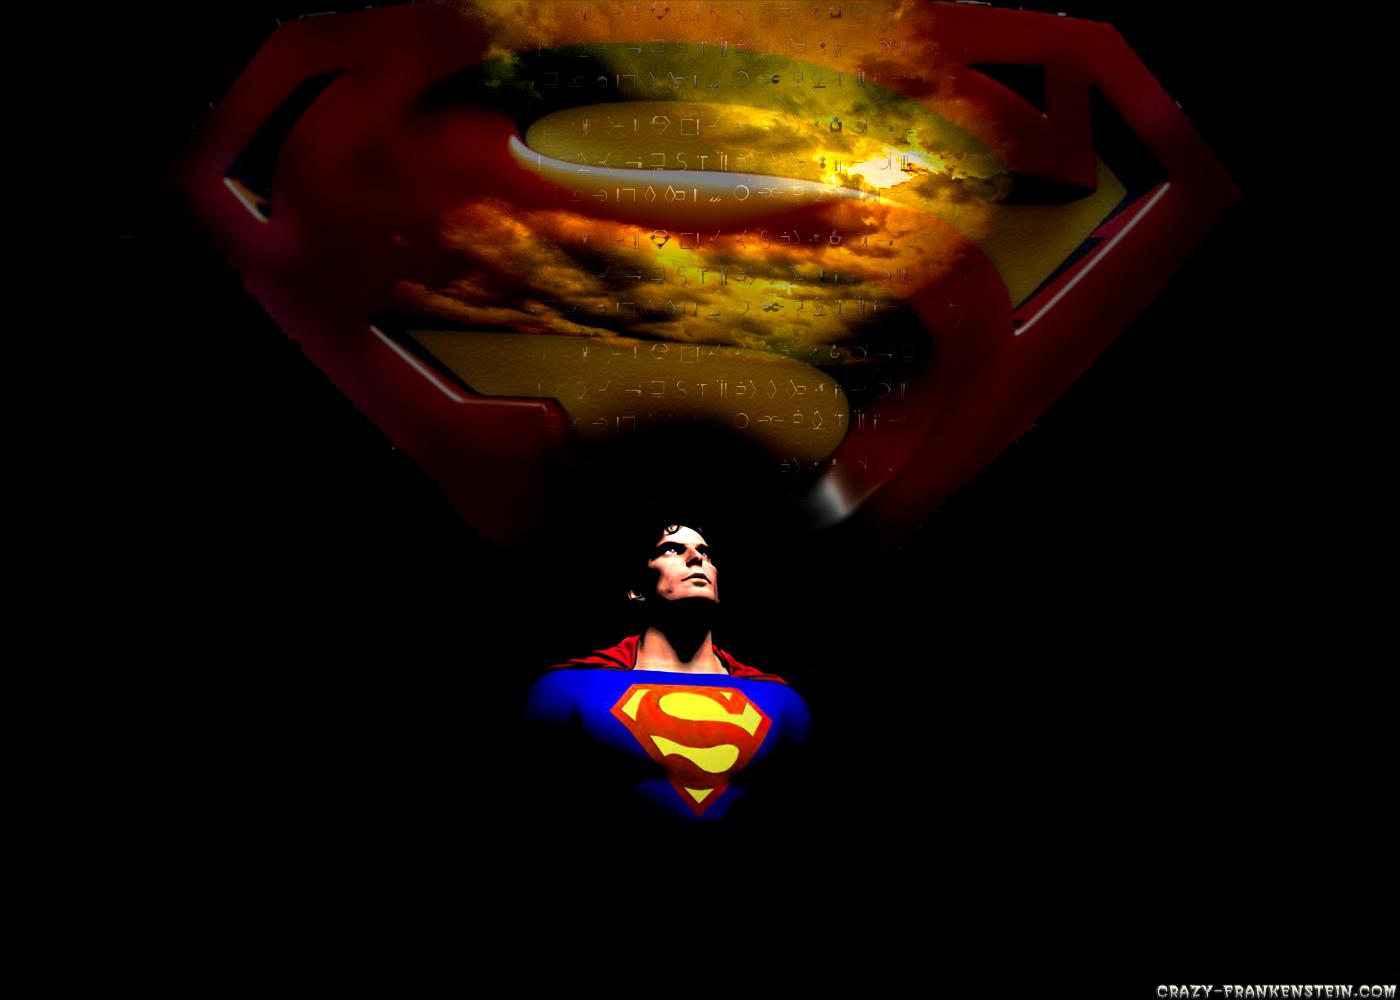 Hd Wallpaper Superman Jessica Alba Hd Iphone Wallpaper 1400x1000